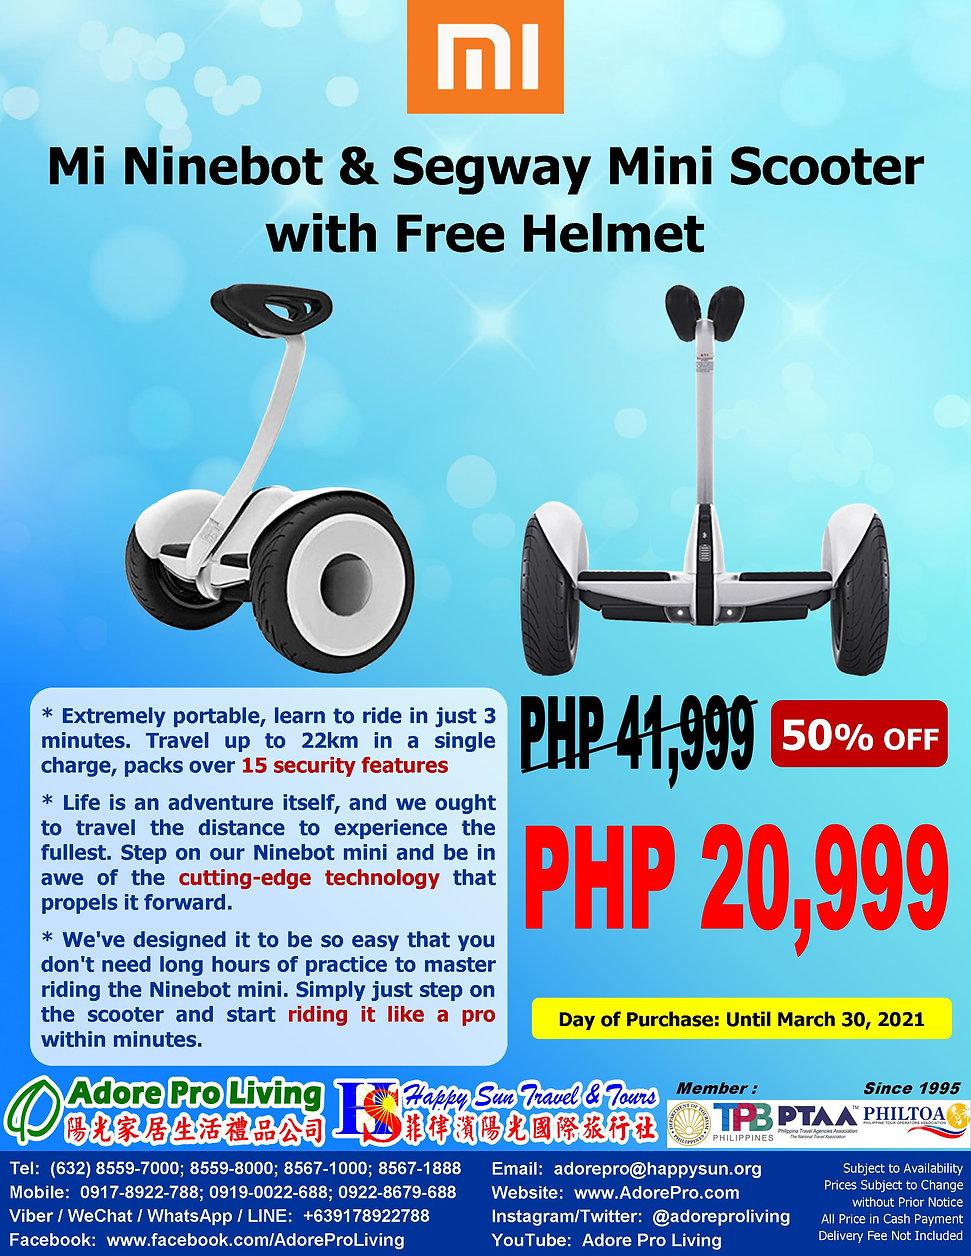 2B.NinebotSegwayMiniScooter_Mi_20210312.